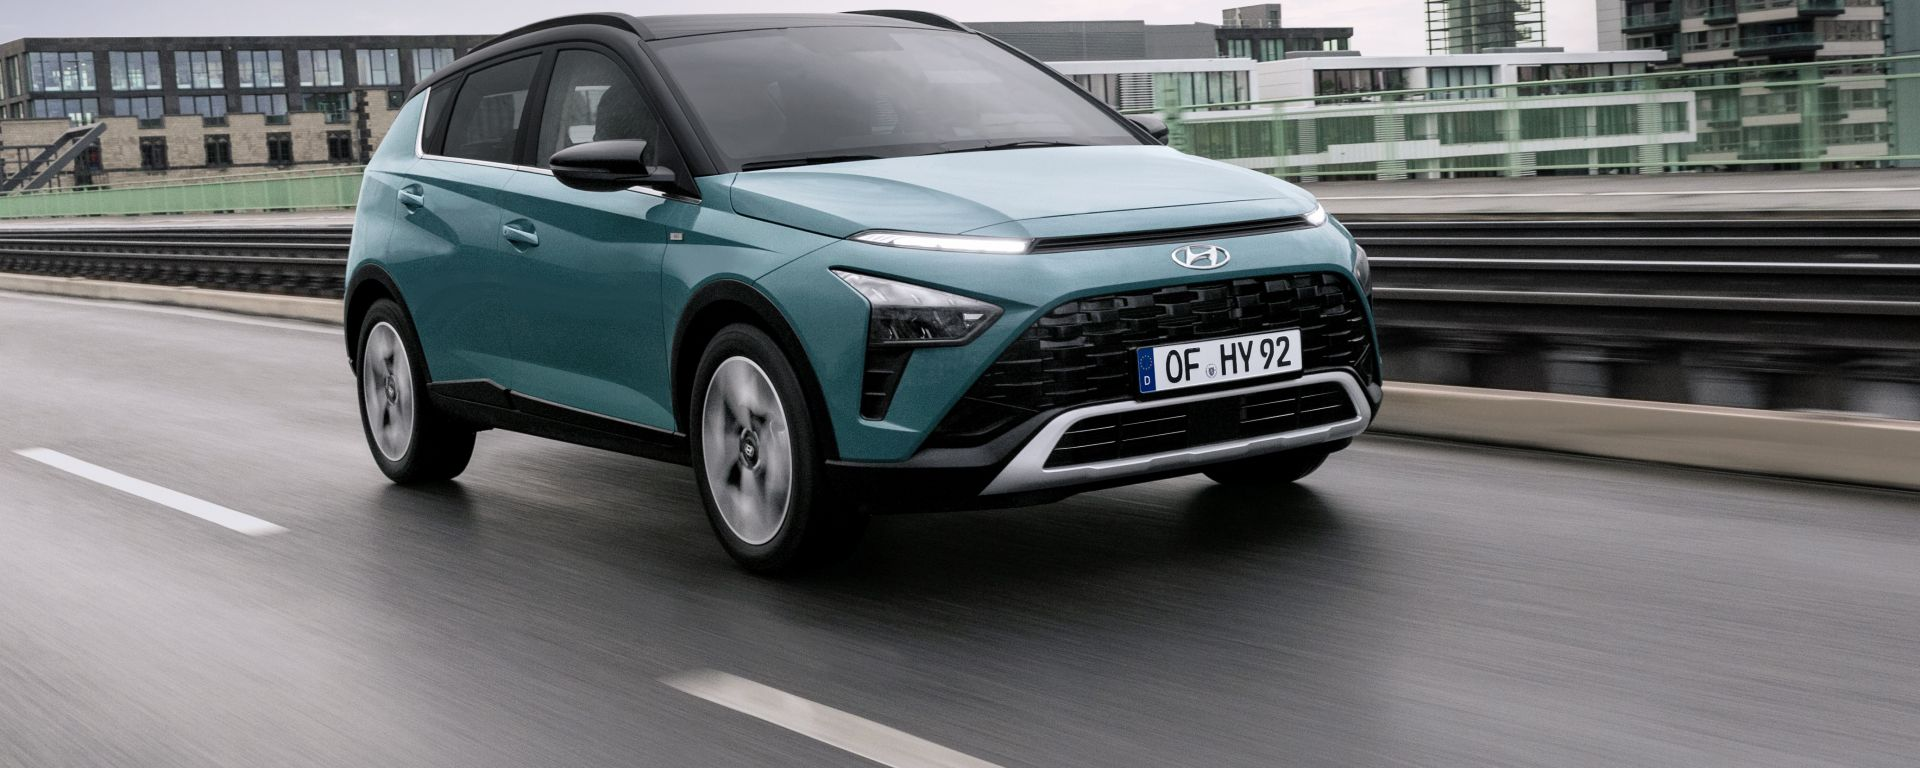 Nuova Hyundai Bayon 2021